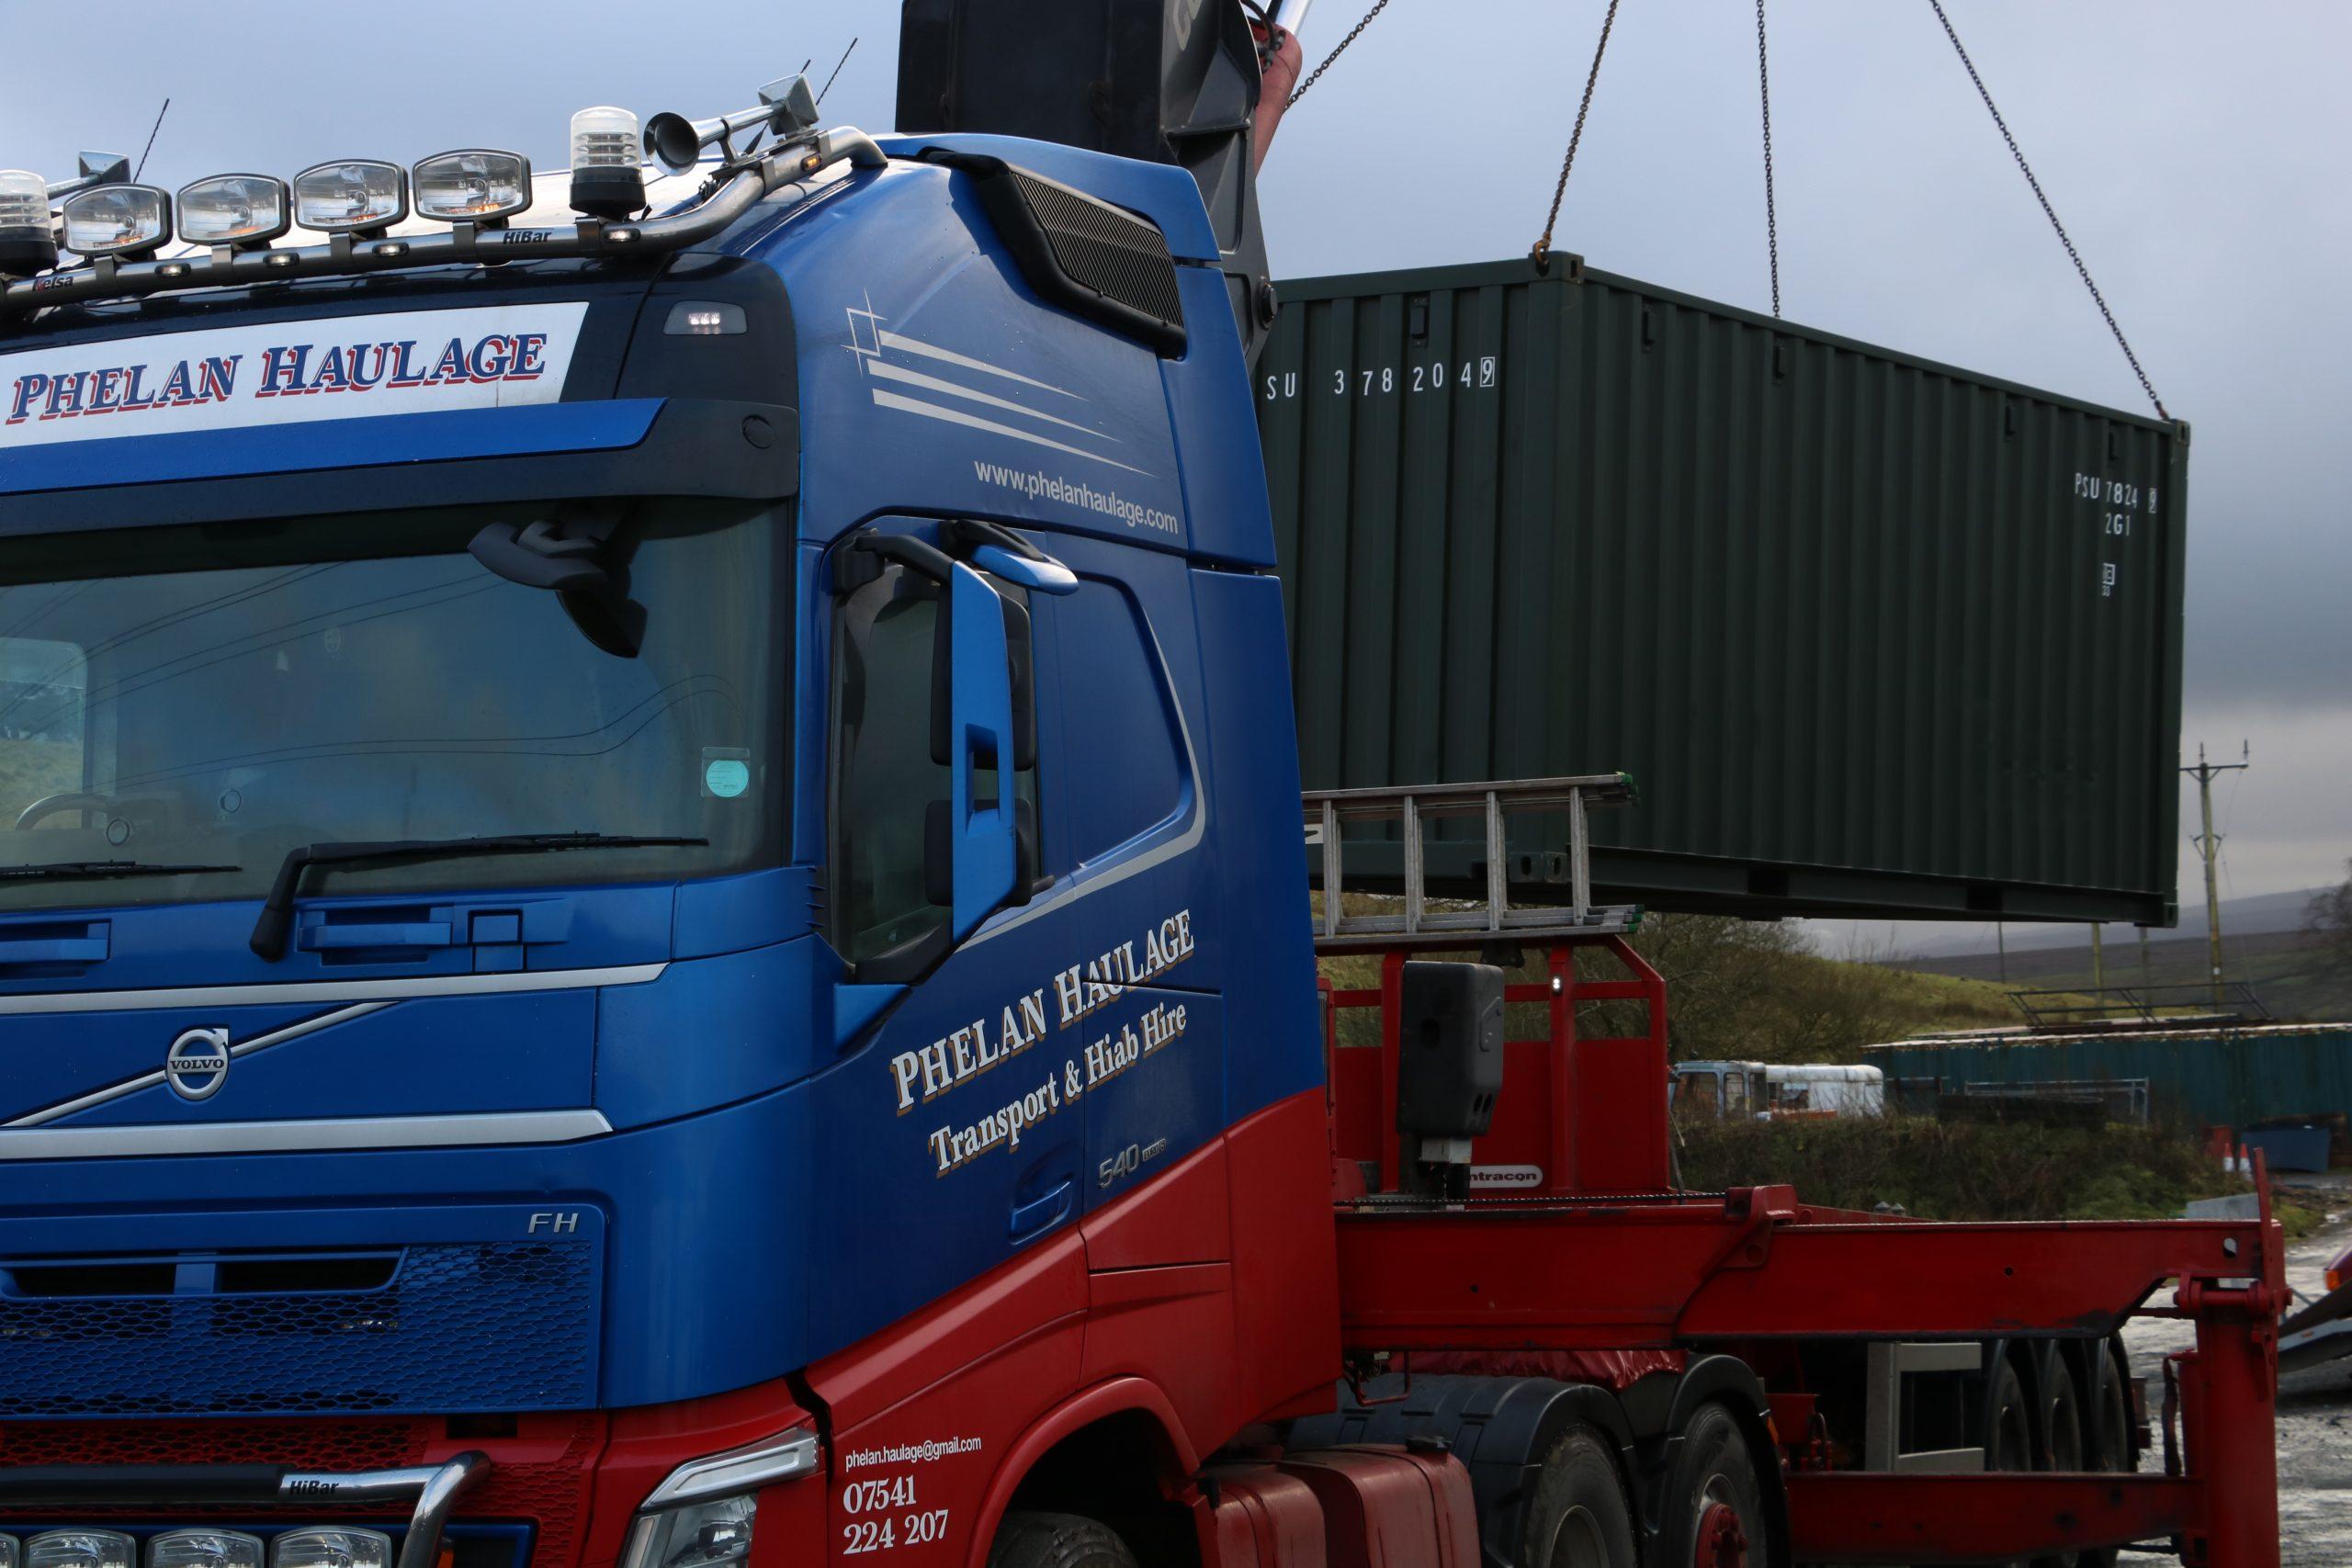 phelan_haulage_hiab_services_hire_truck51